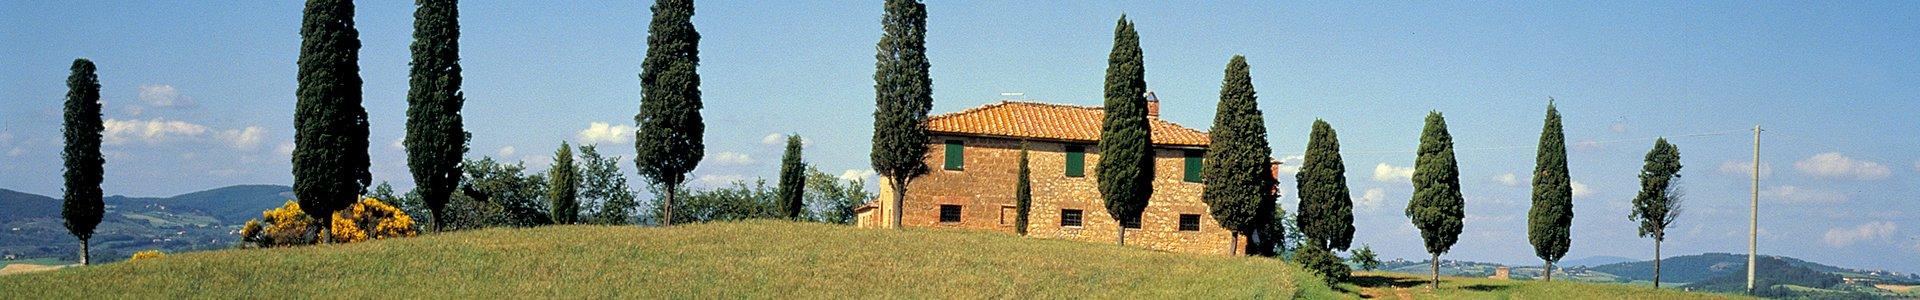 Cultuurvakantie Toscane, Italië